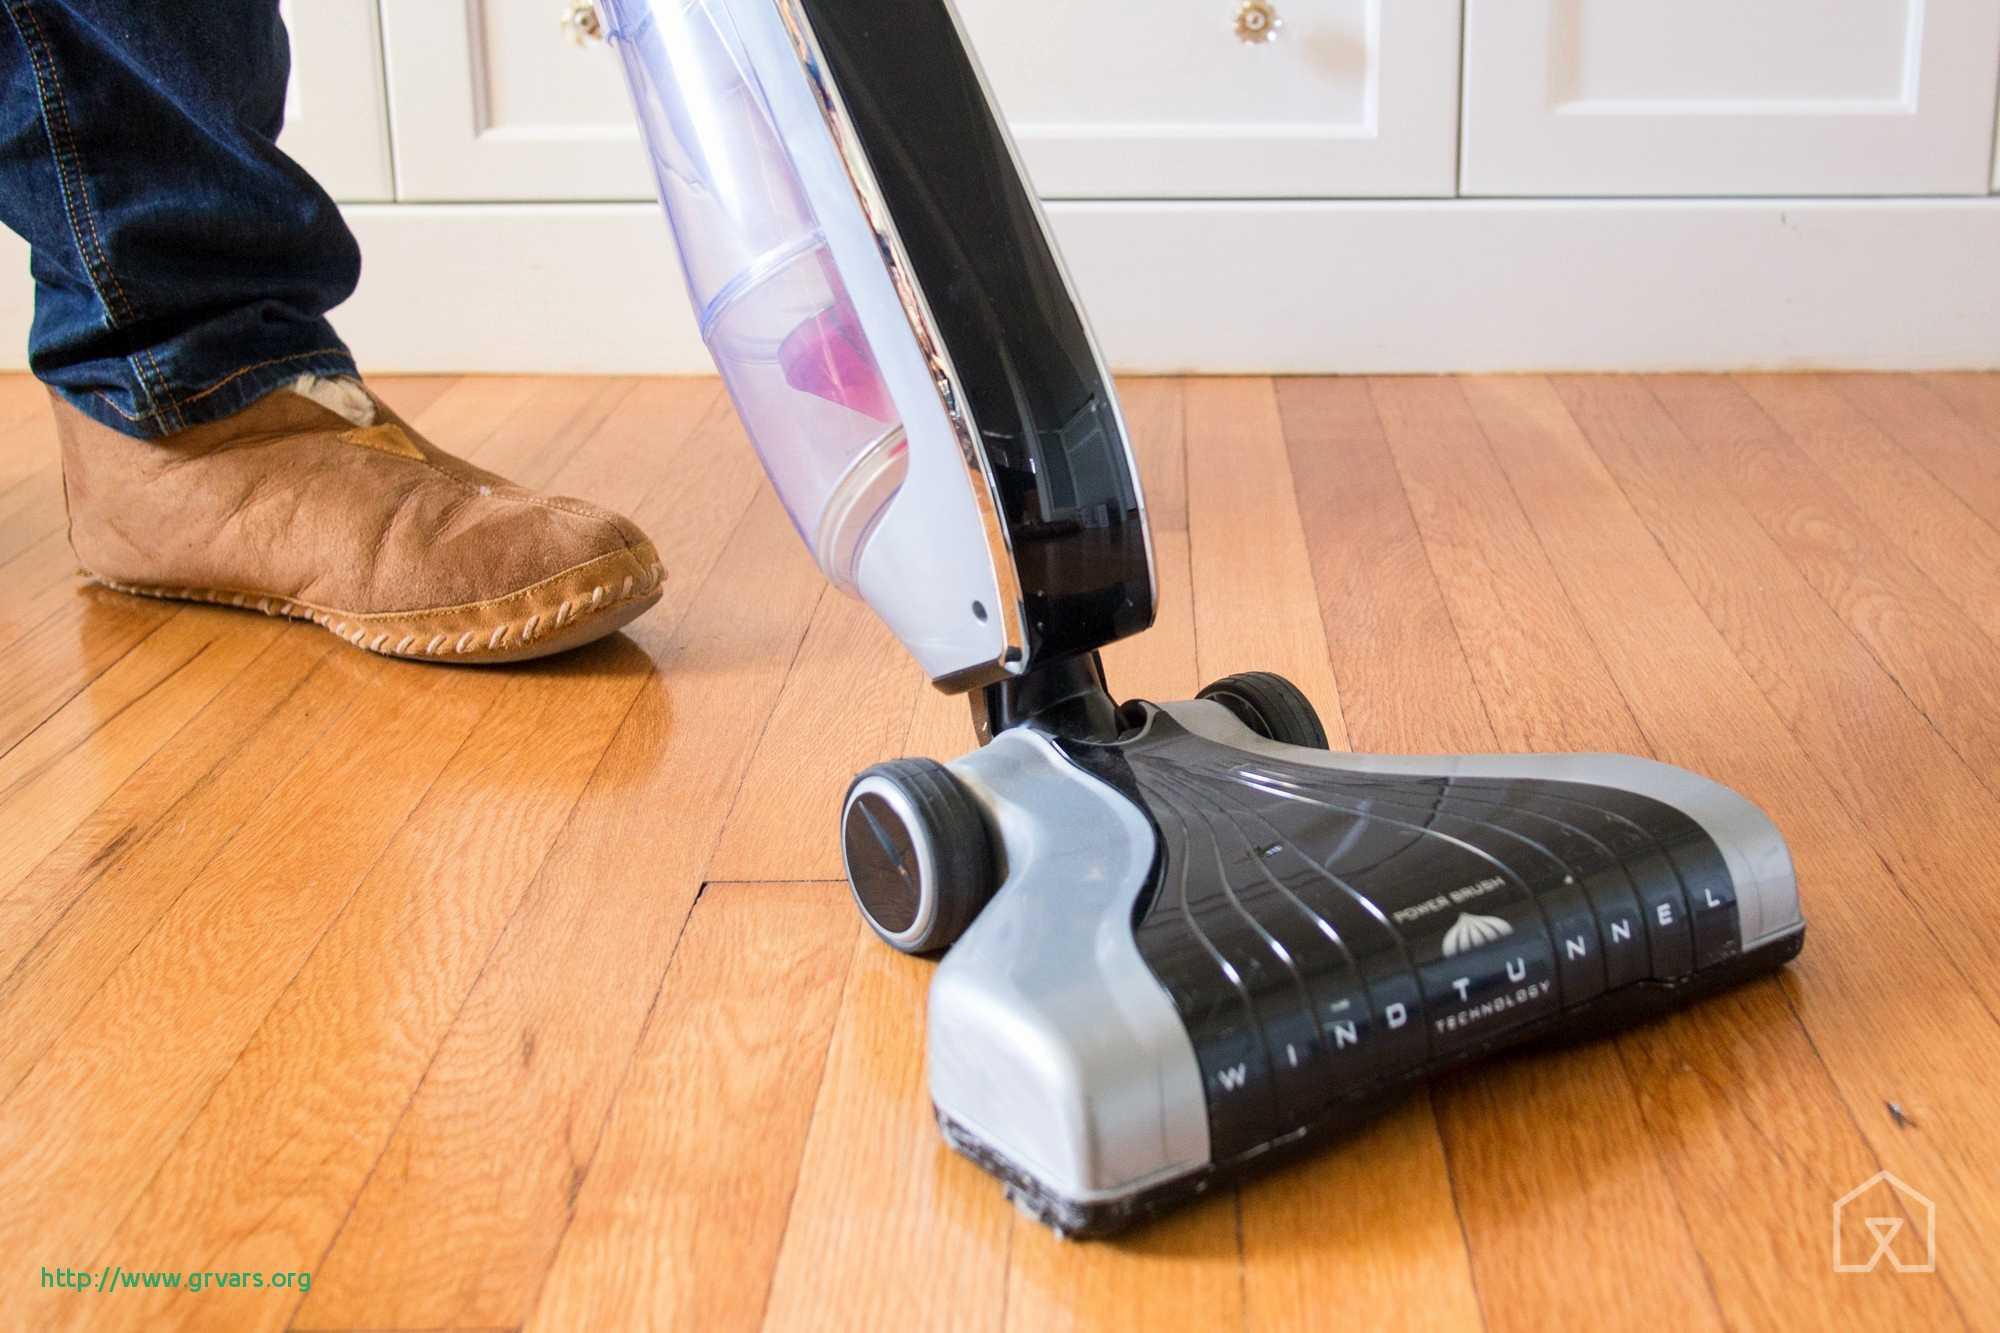 hardwood floor vacuum and steamer of steamer on laminate floors inspirant 11 best od floors pinterest with steamer on laminate floors inspirant 11 best od floors pinterest awesome wood floor steam